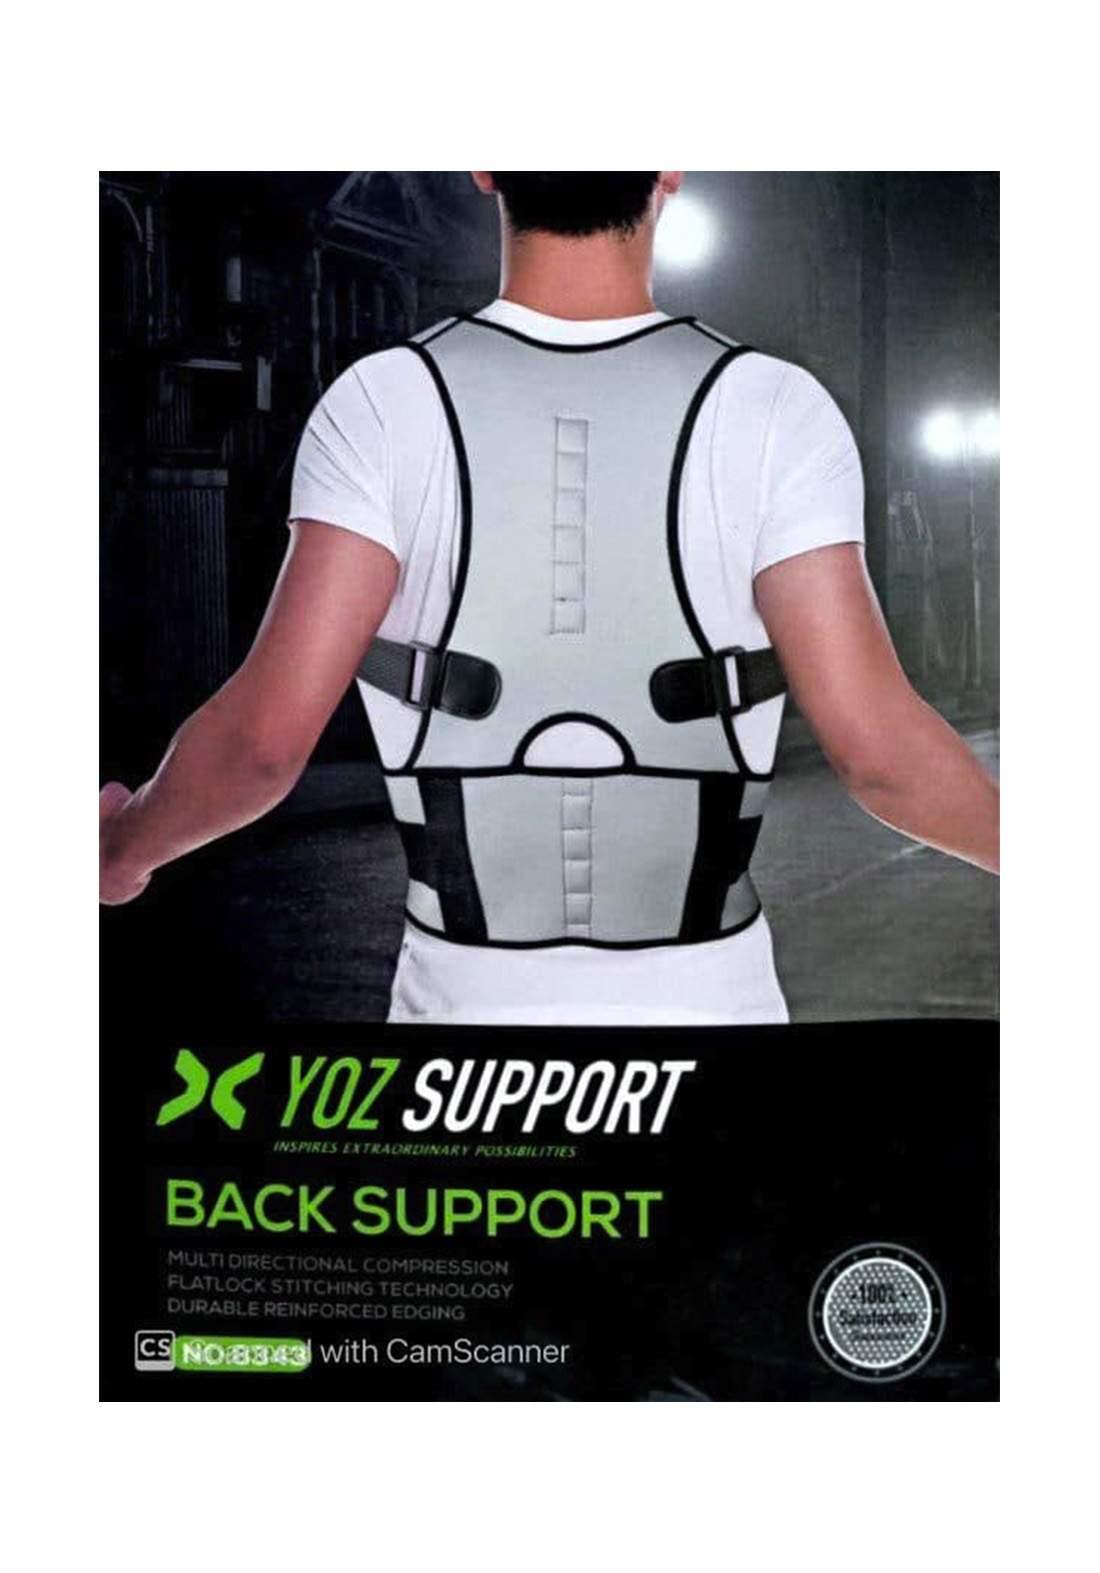 YOS Long Spine Support Brace مشد و حزام الظهر لتقويم العمود الفقري